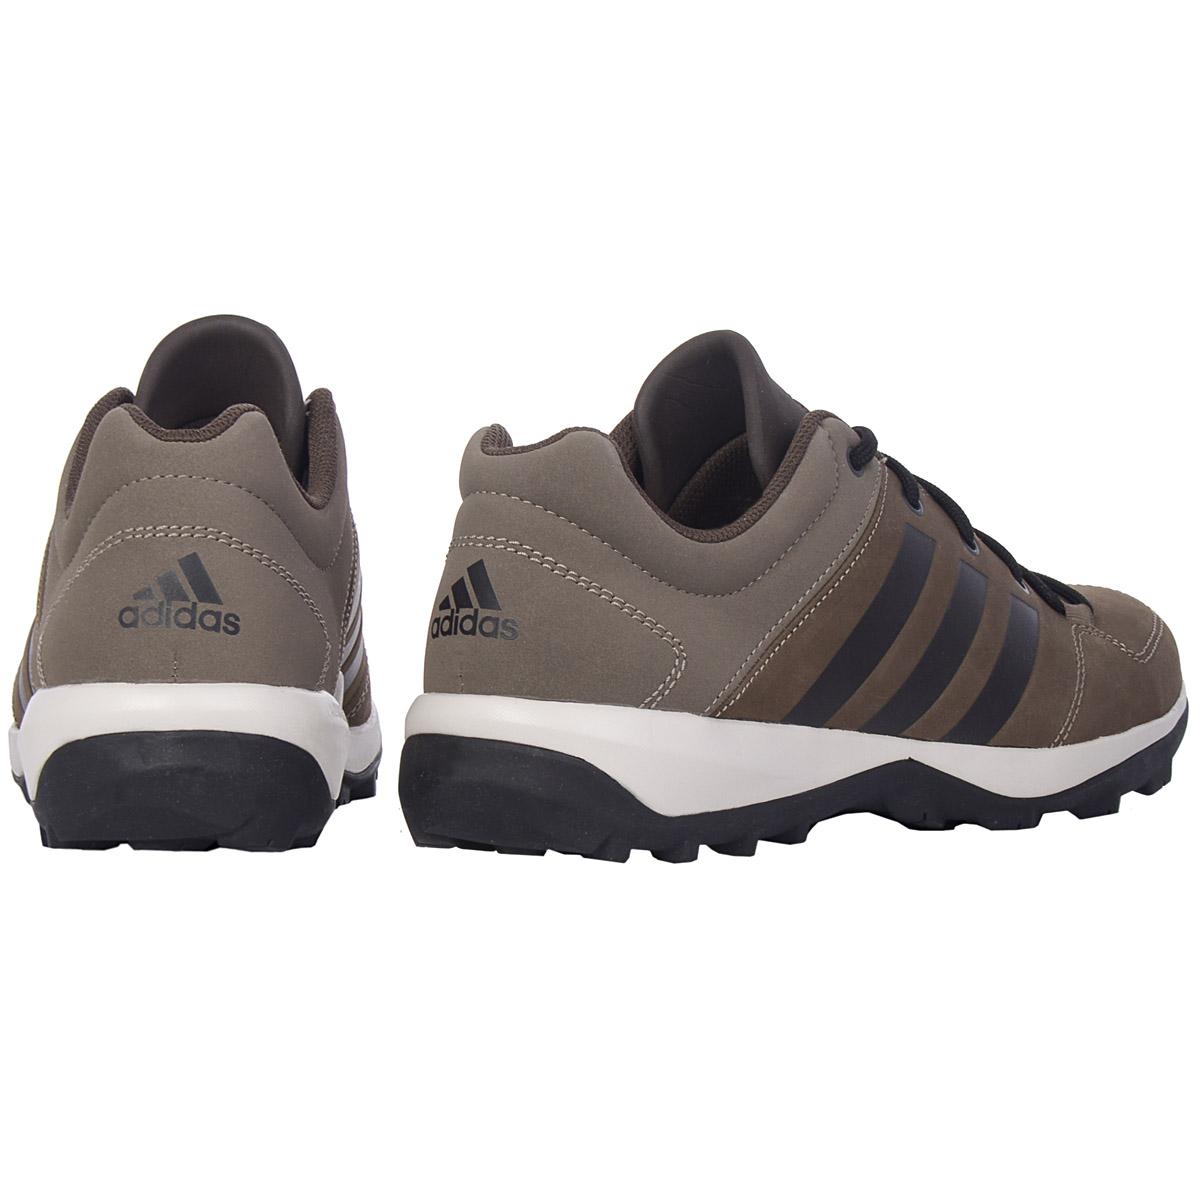 timeless design 24976 a044f NEU adidas Daroga Plus Lea Herren Schuhe Braun AQ3978 SALE 3 3 von 5 ...